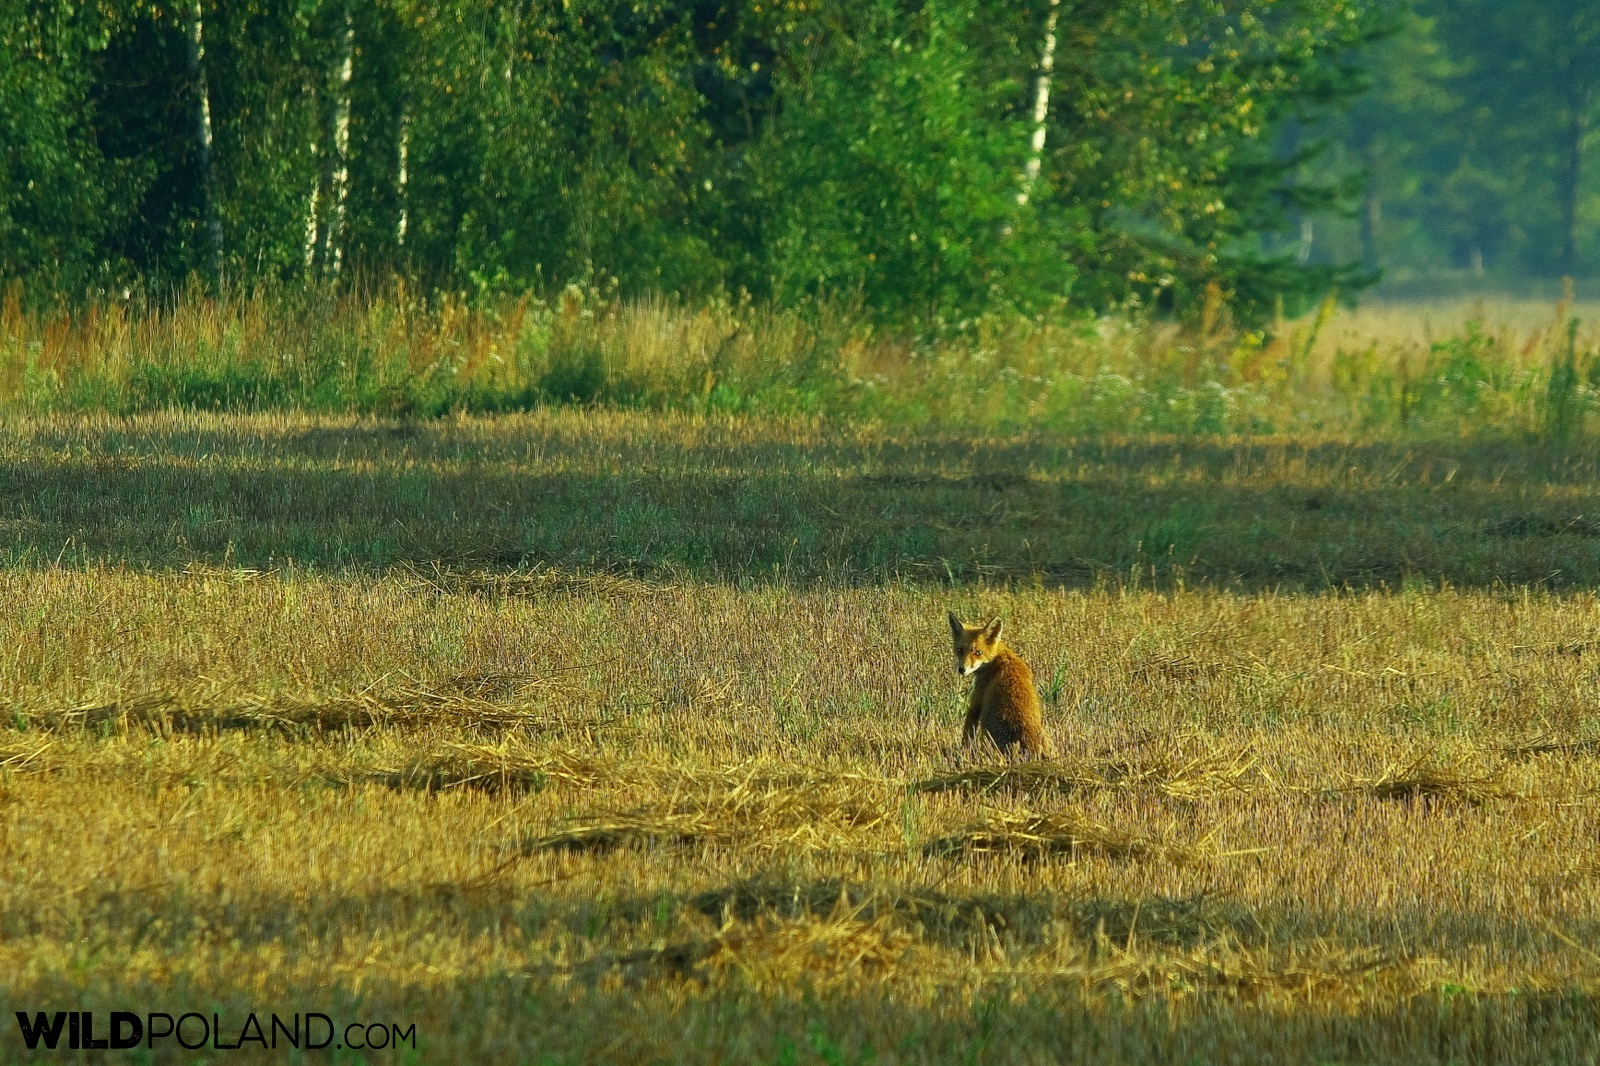 Red fox in the Białowieża Forest, photo by Andrzej Petryna